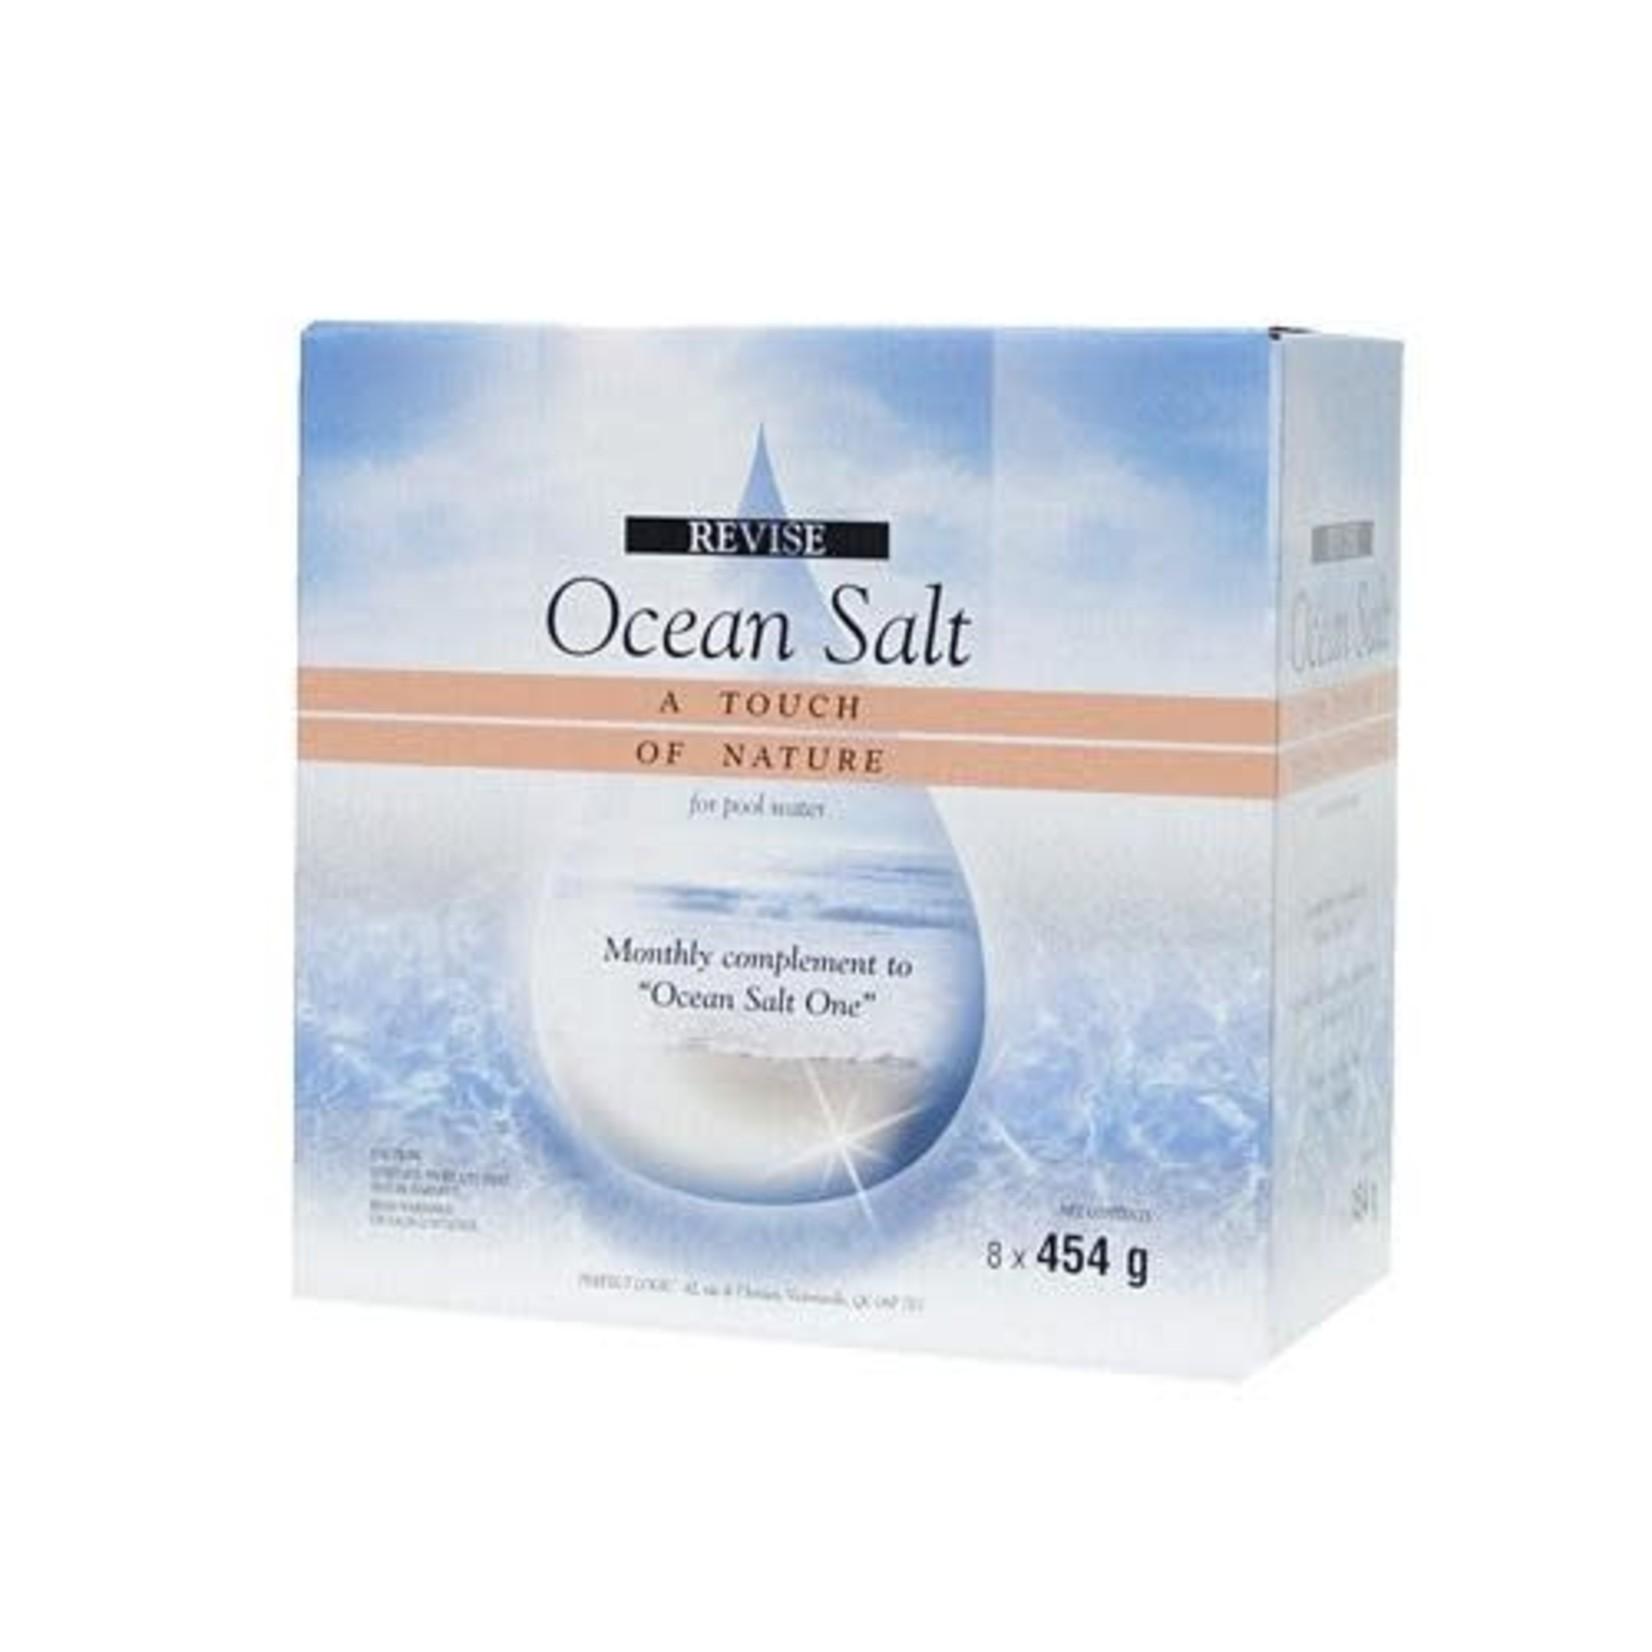 Sani Marc SANIMARC OCEAN SALT REVISE 454g